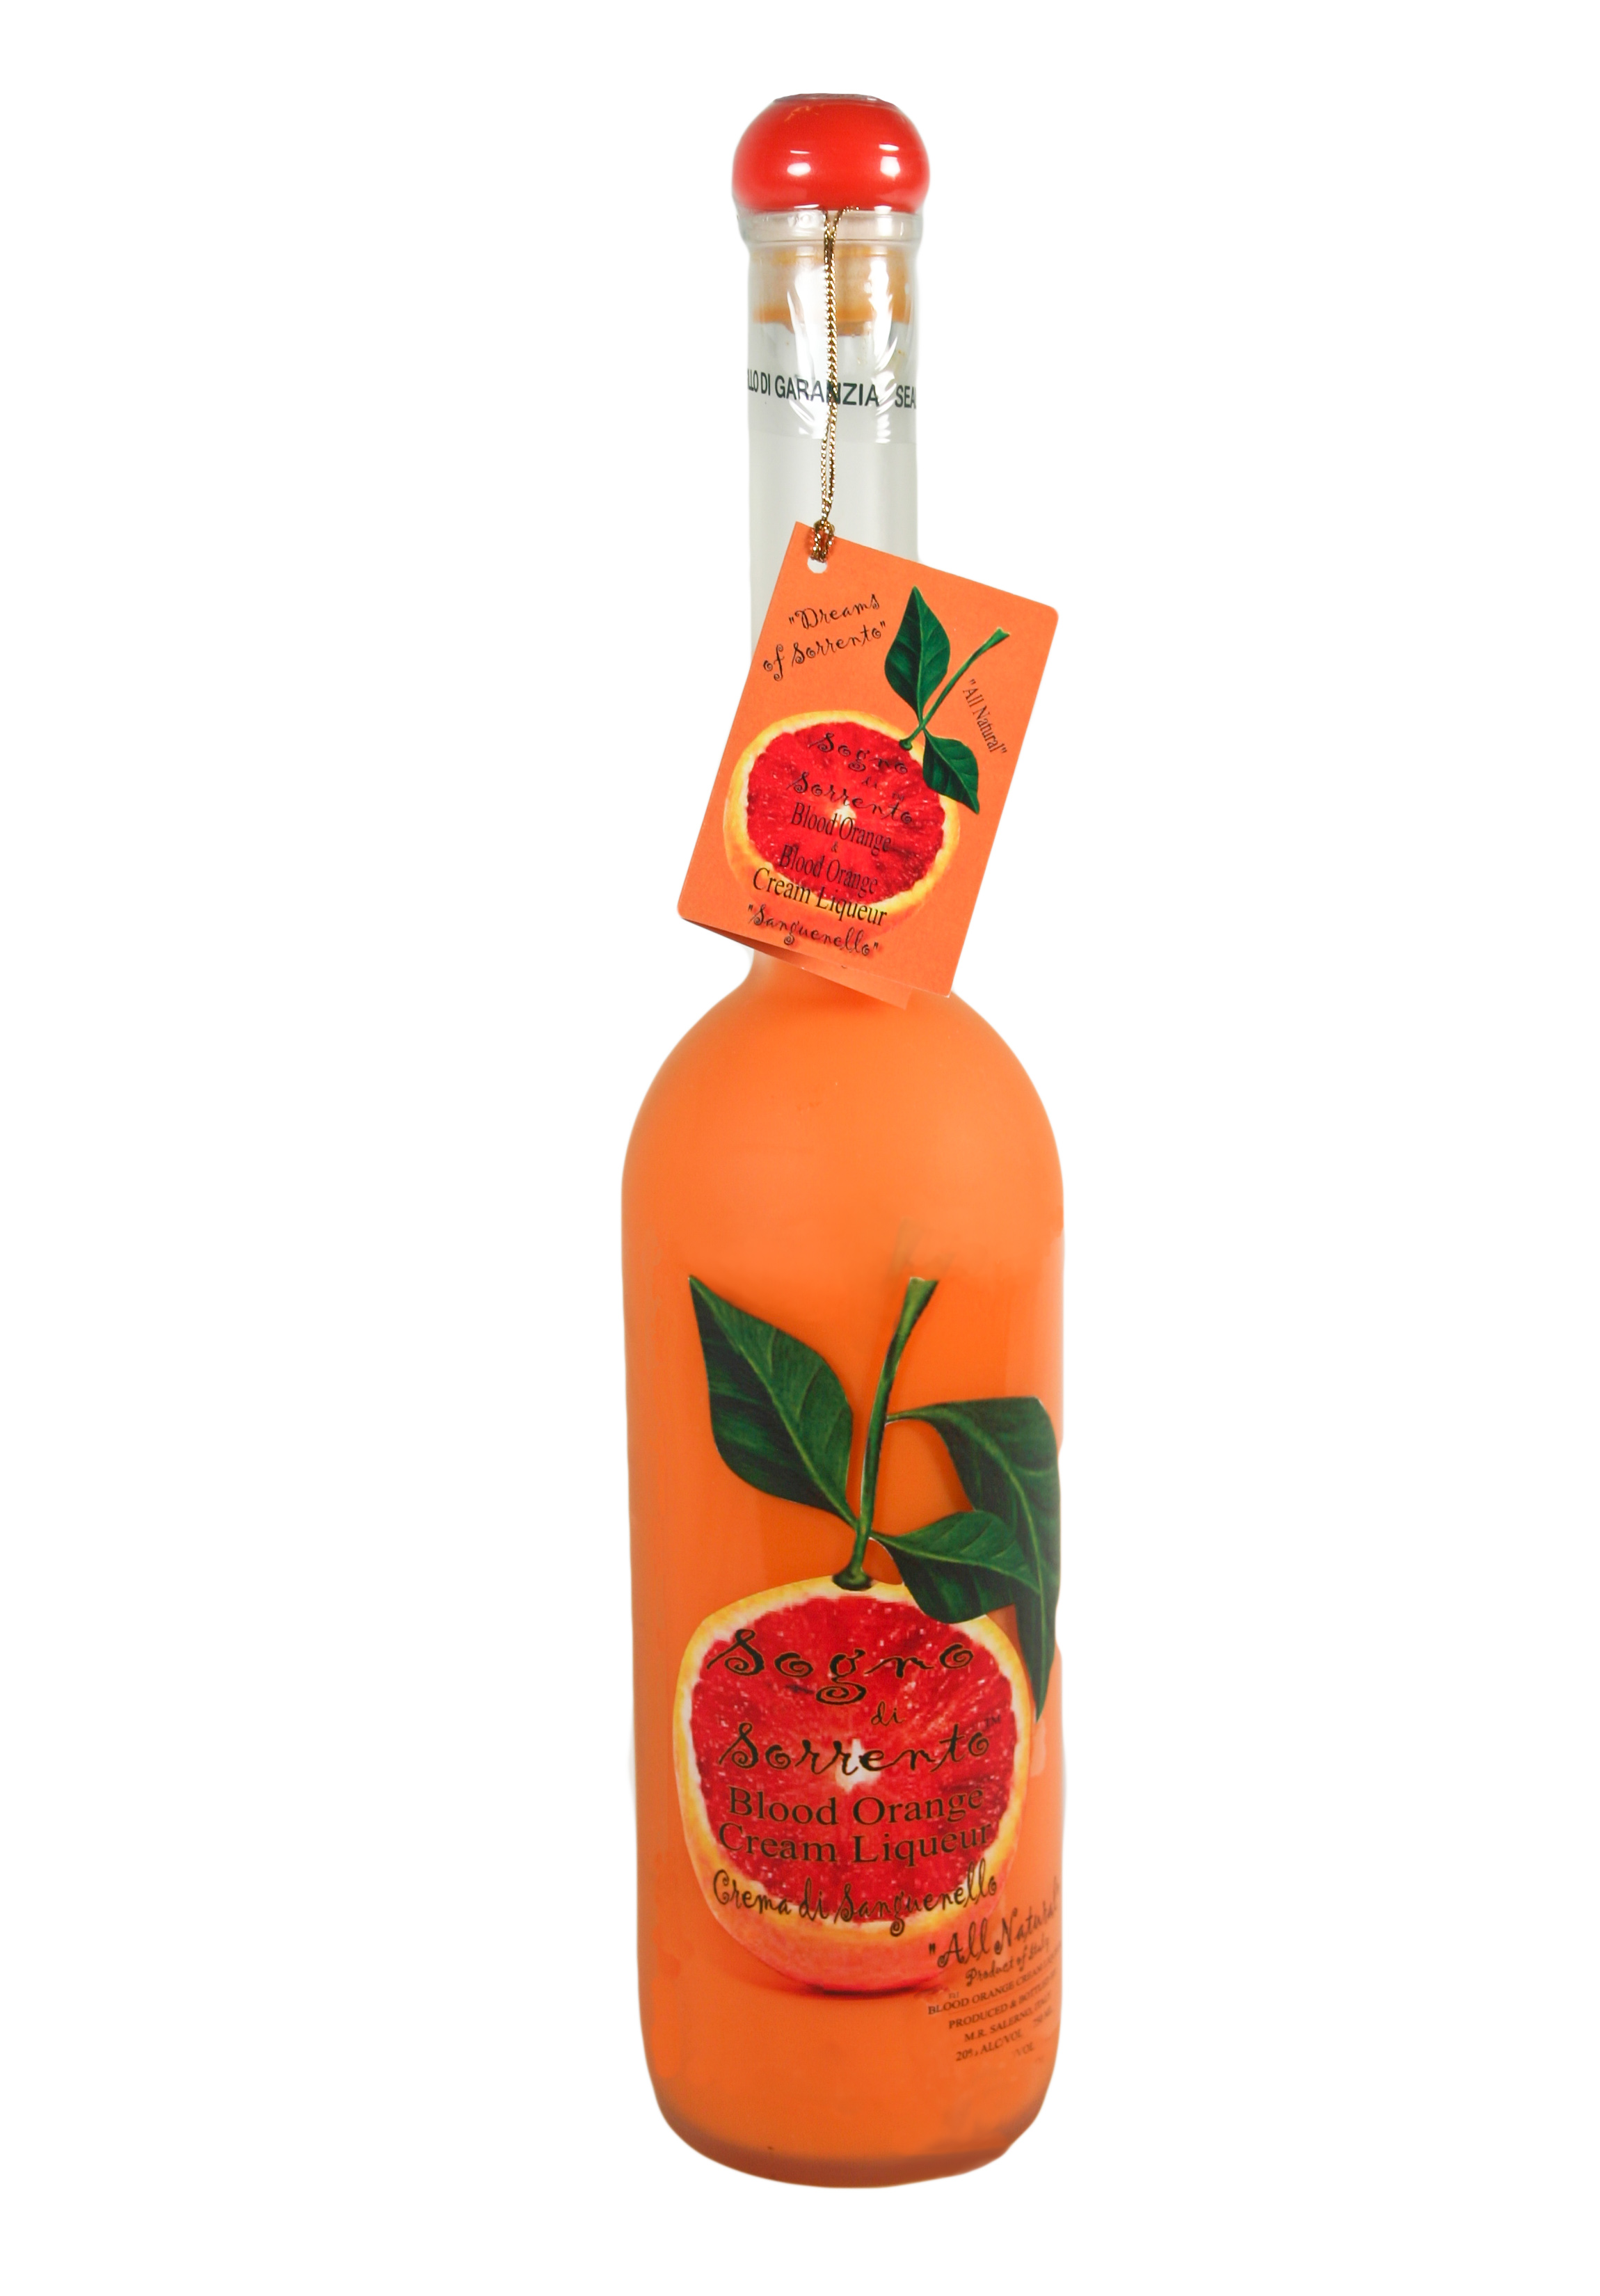 Sogno-di-Sorrento-Blood-Orange-Cream-Liqueur.jpg